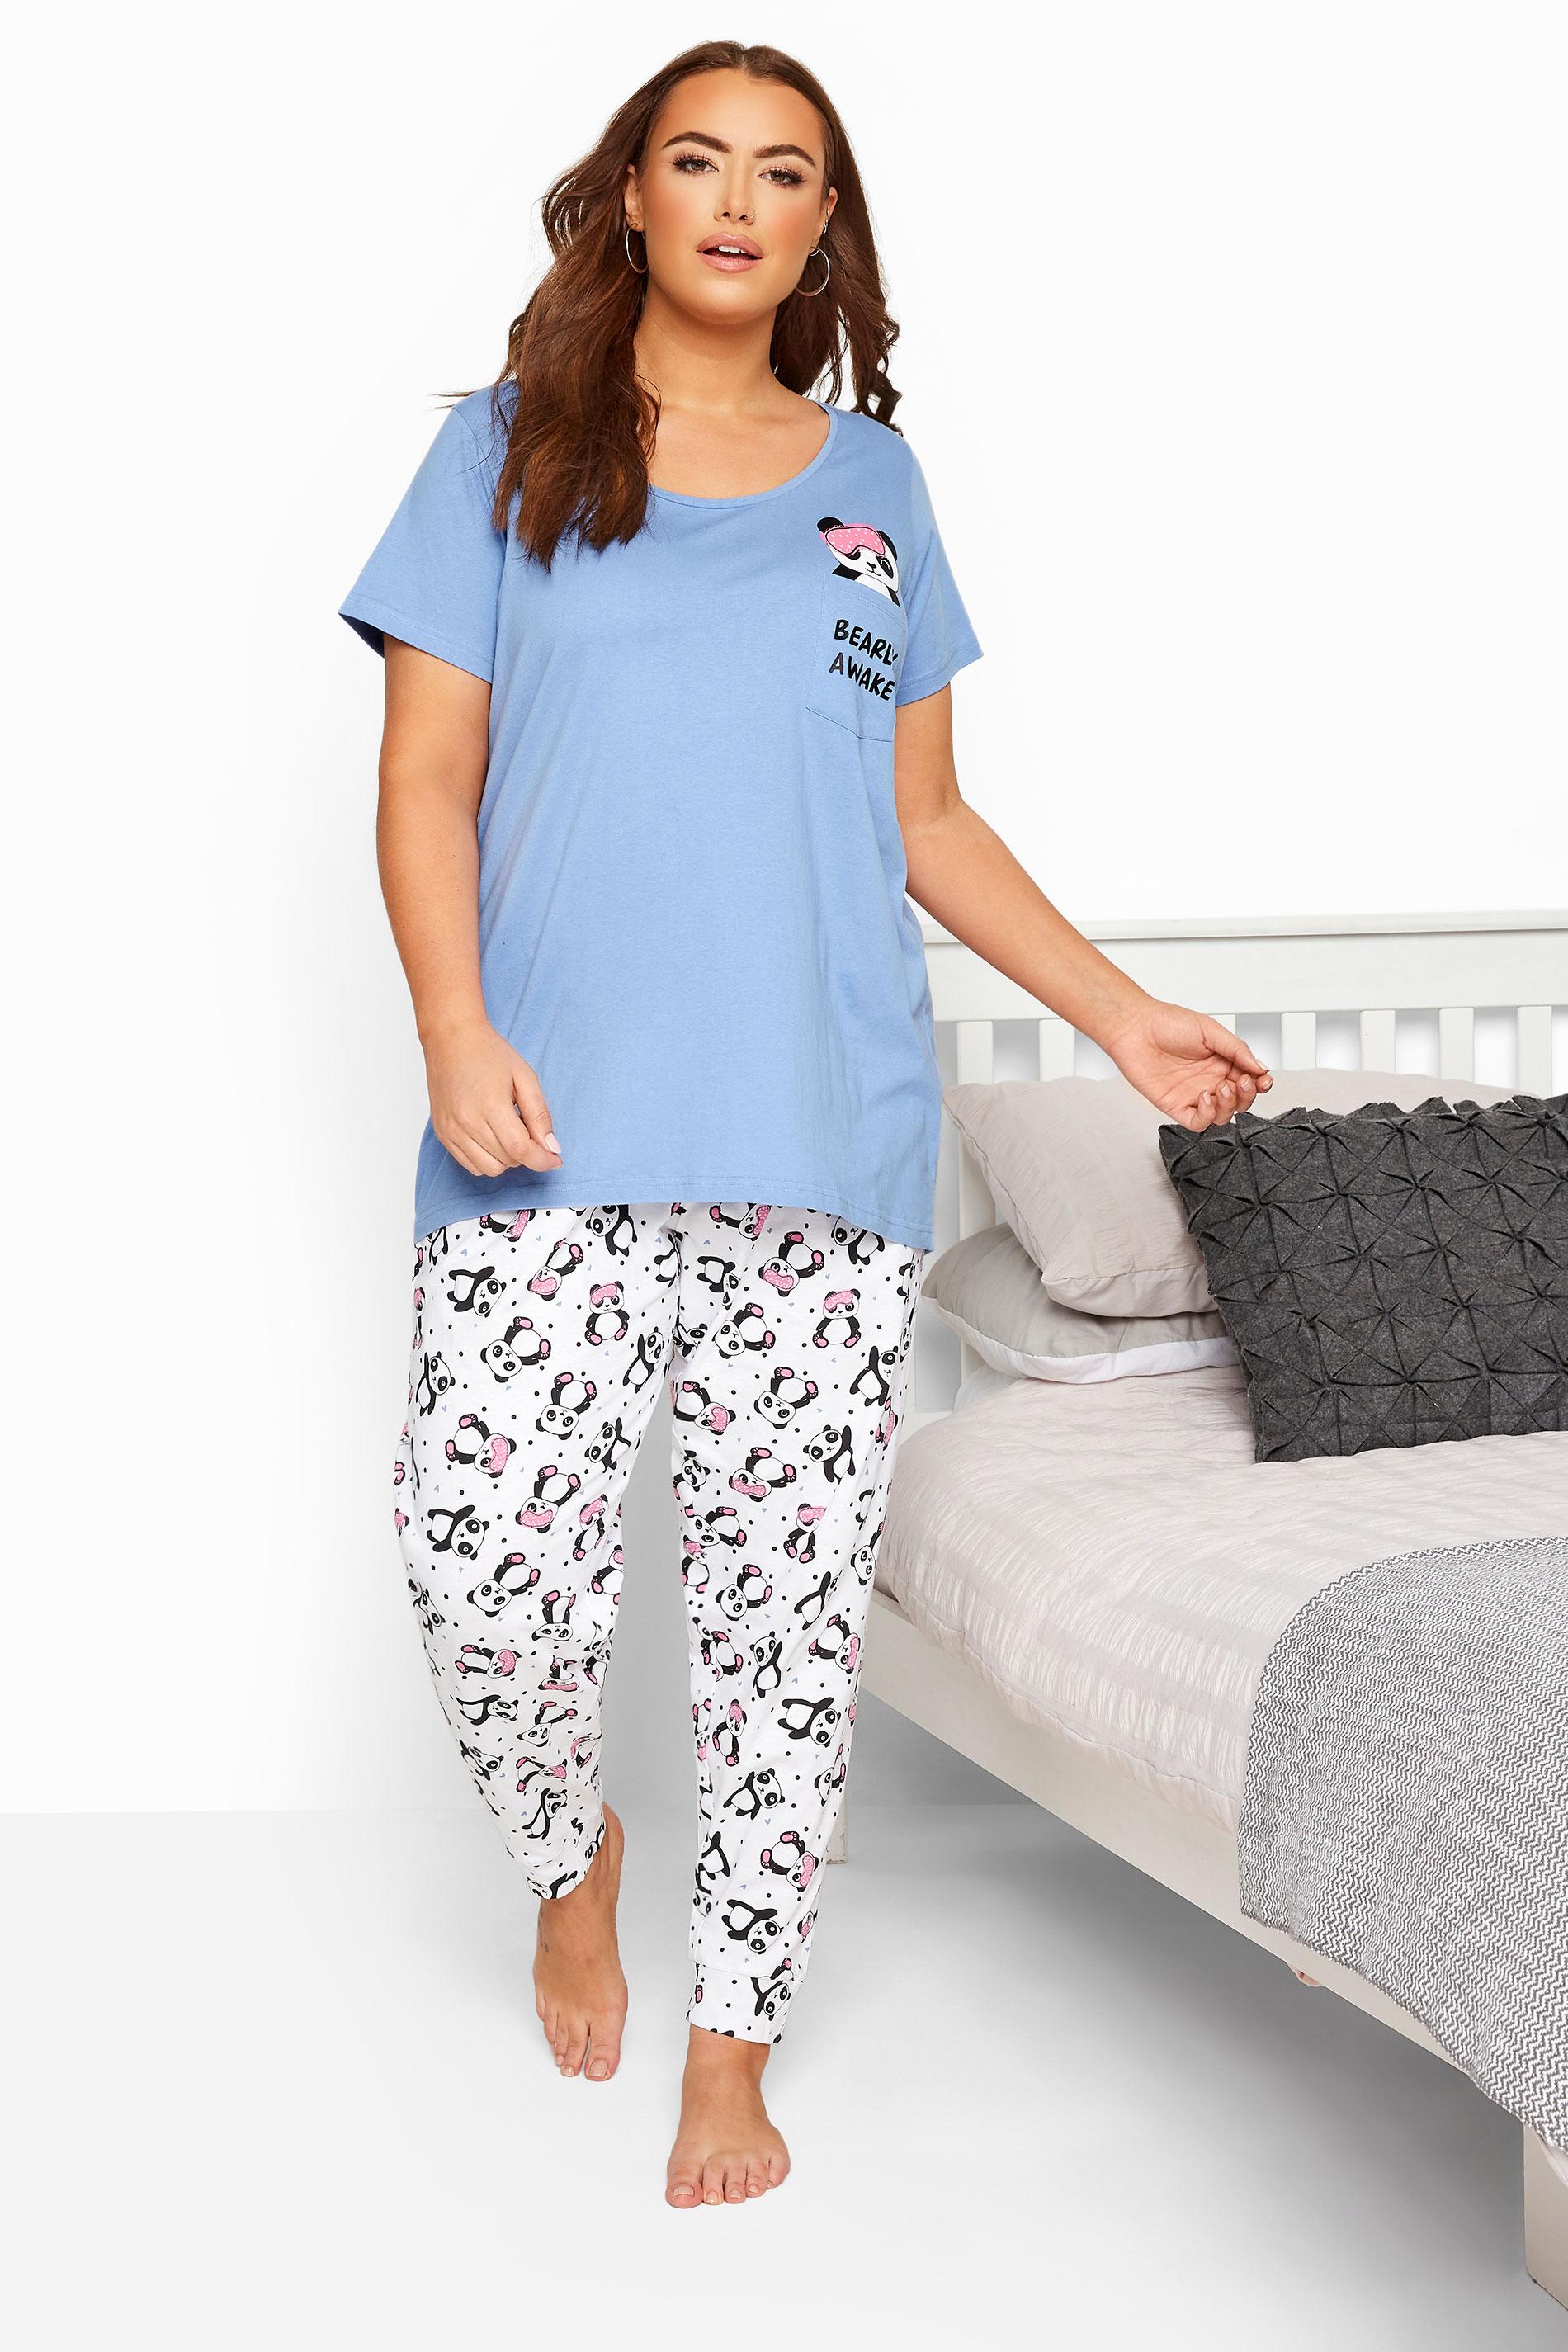 Blue Panda Slogan Pyjama Set